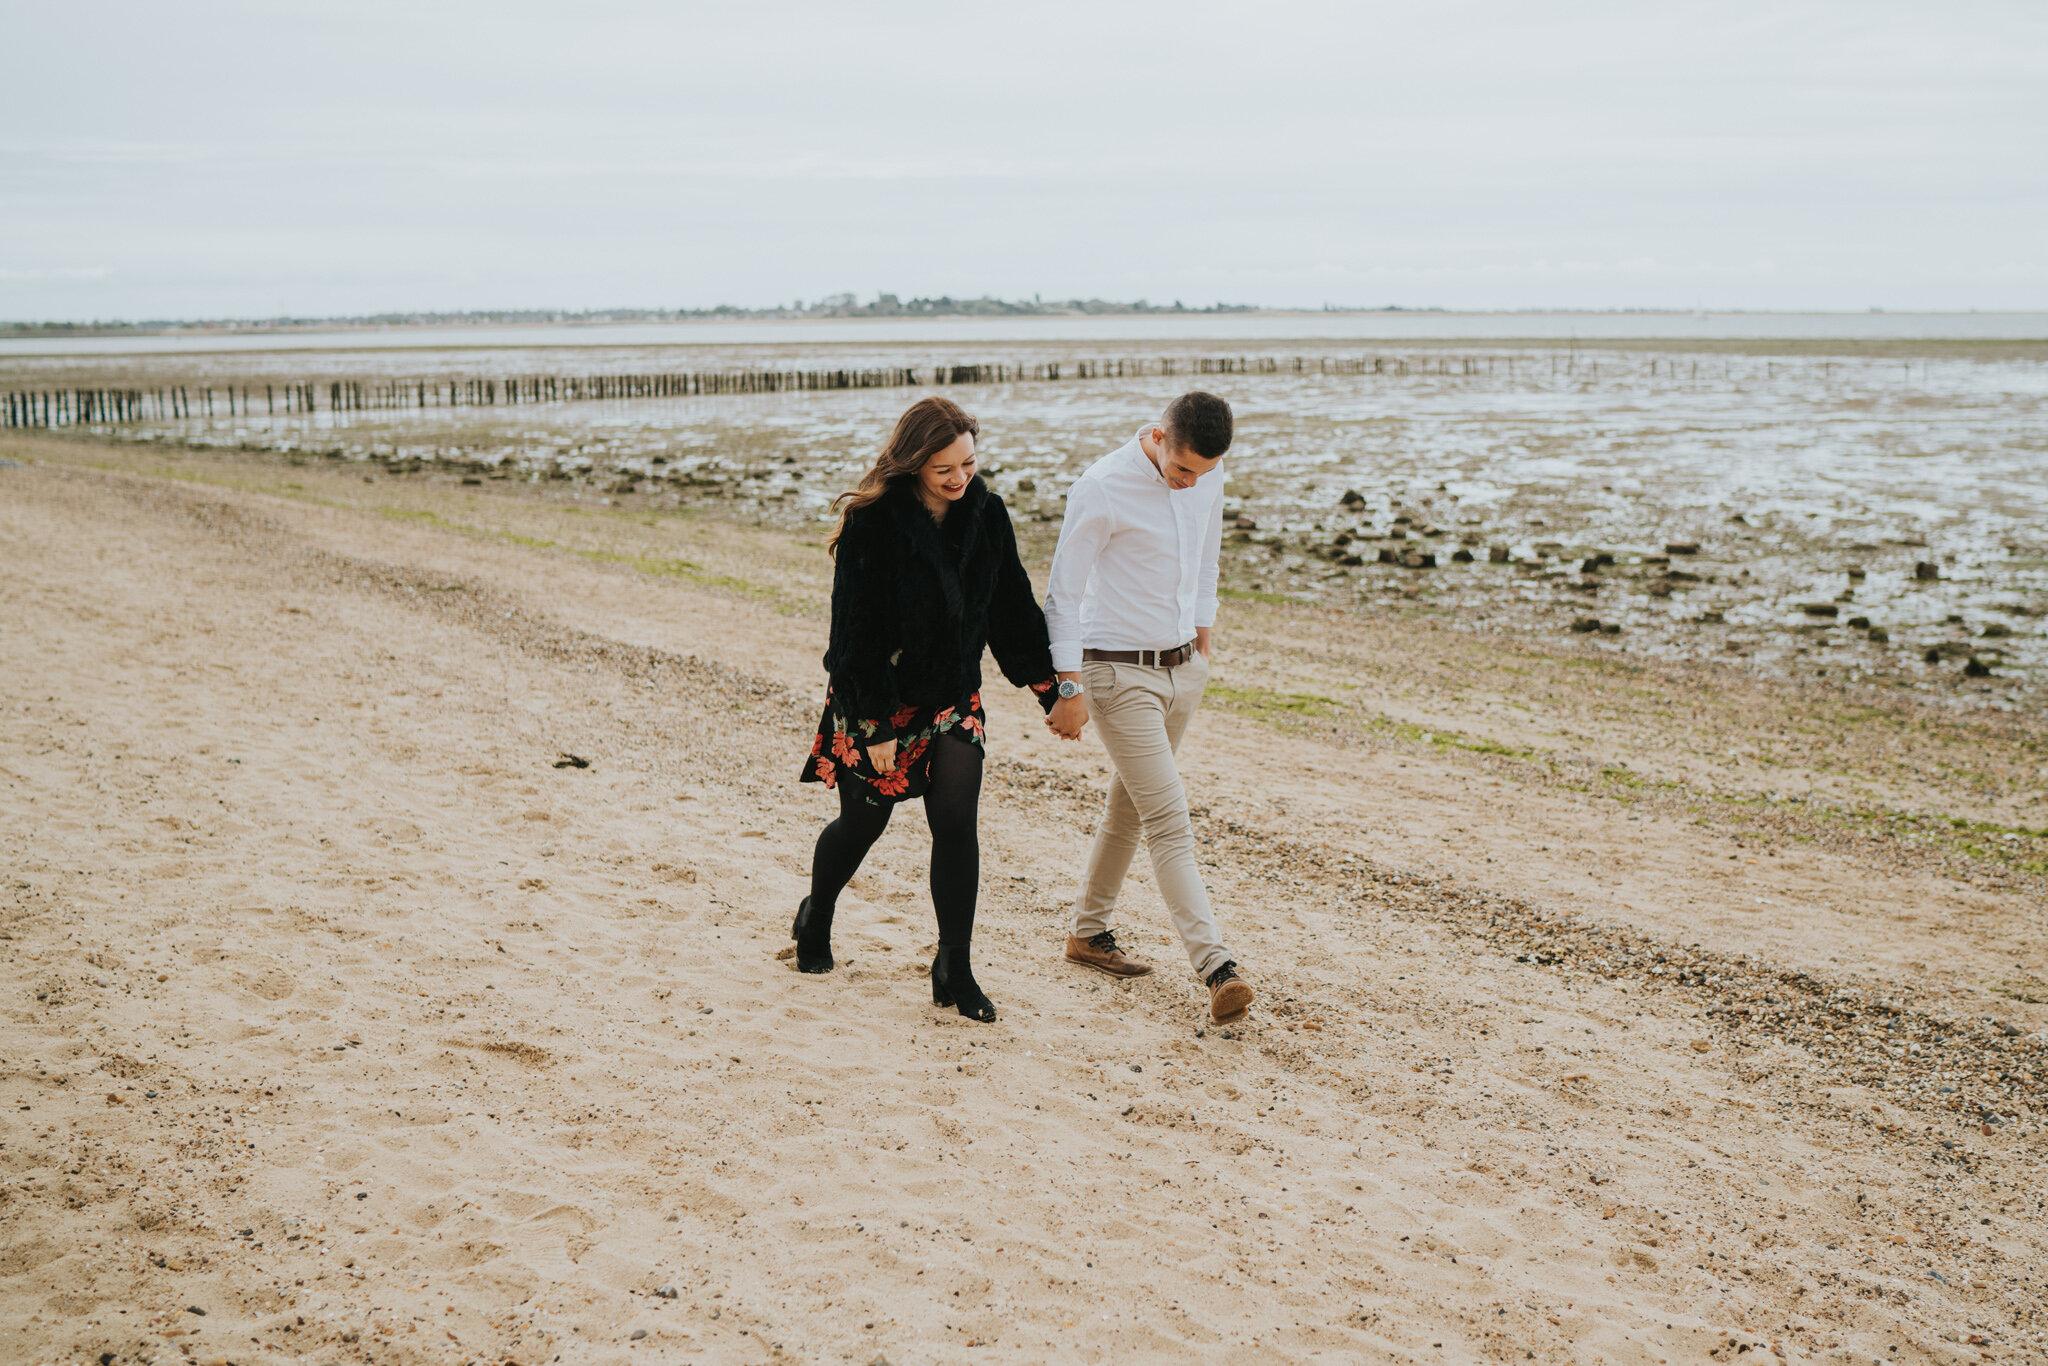 engagement-pre-wedding-hannah-michael-cudmore-grove-east-mersea-grace-elizabeth-colchester-essex-devon-suffolk-and-norfolk-alternative-wedding-and-family-photographer (1 of 51).jpg